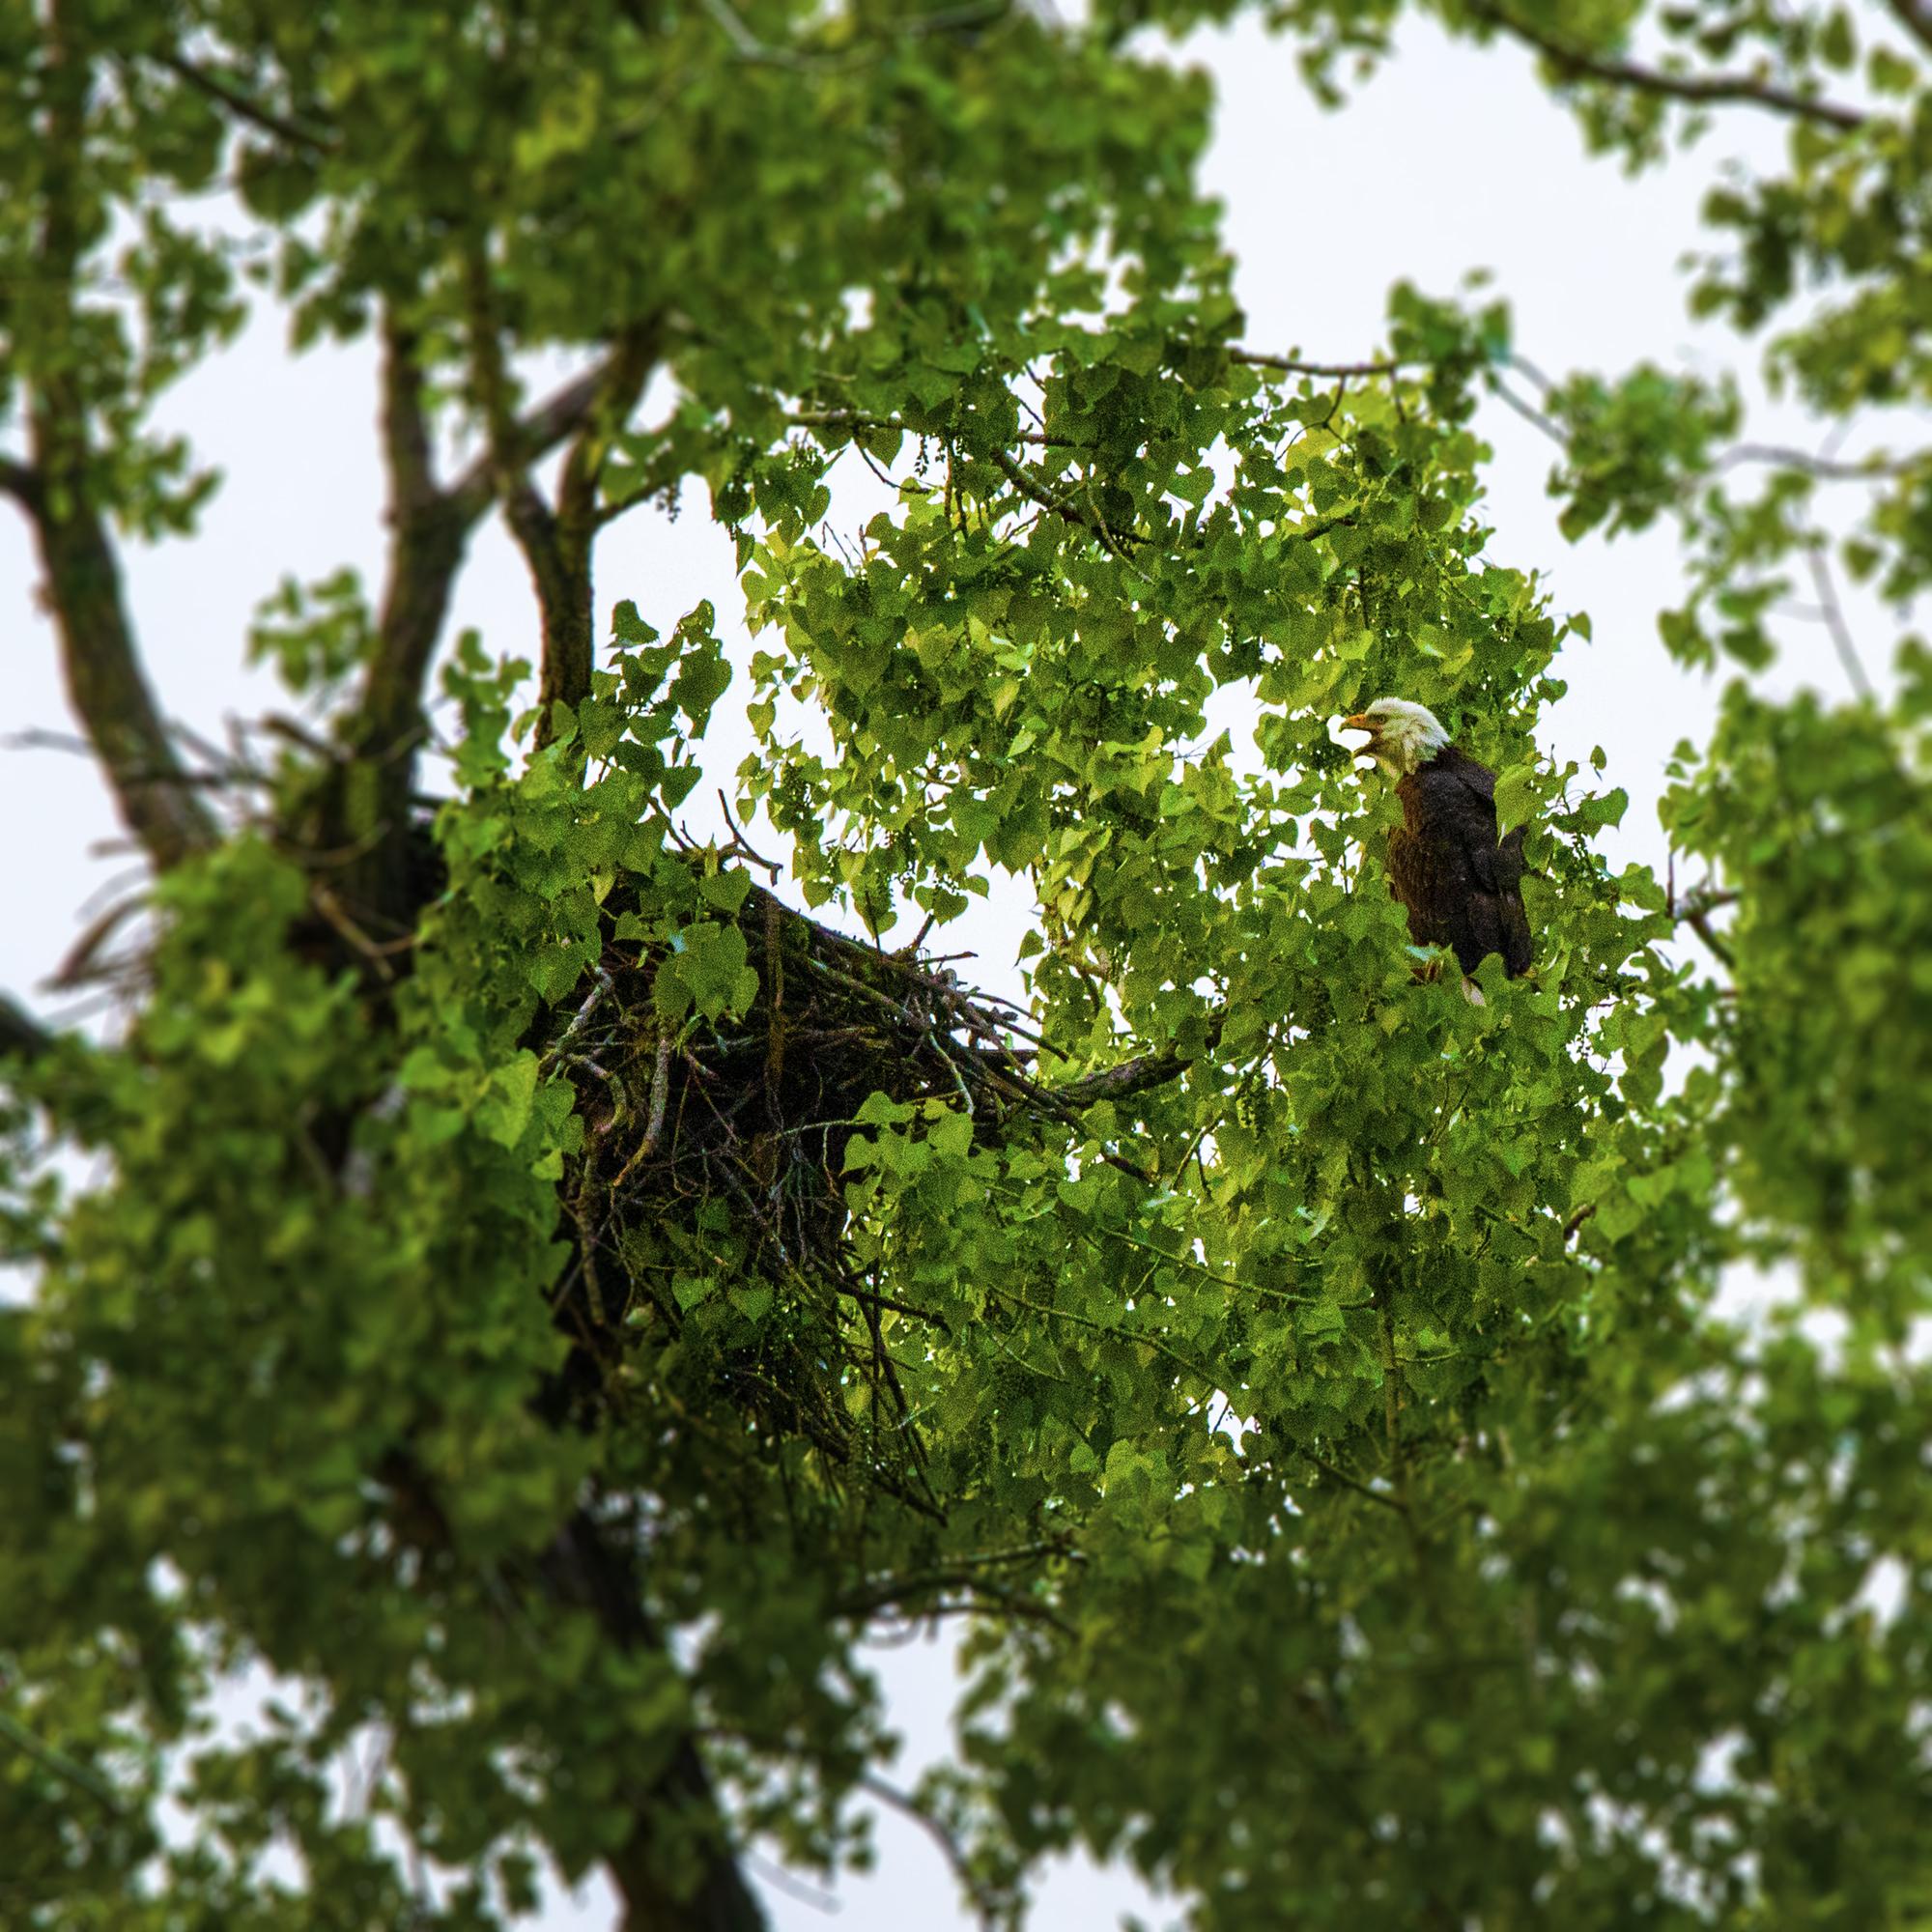 Eagle Nest Apartments: Cedar-Riverside Neighborhood Attractions